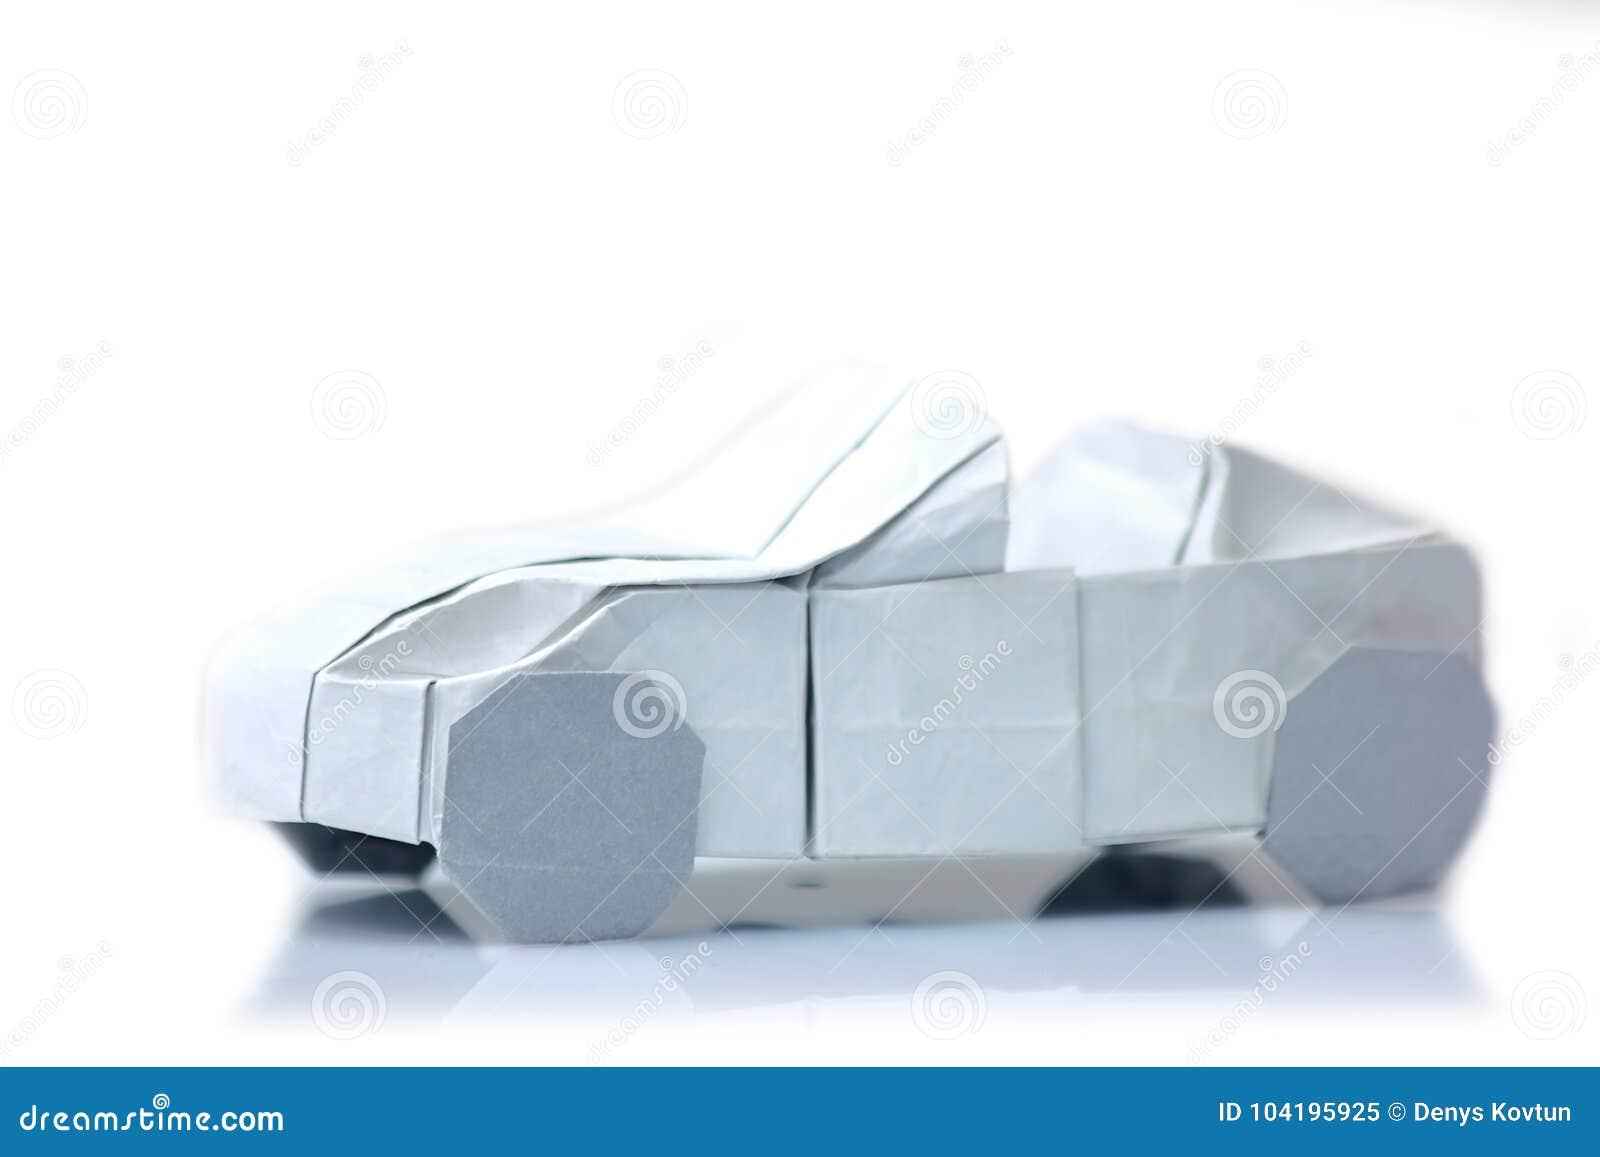 Origami Car Model On White Stock Image Image Of Figure 104195925